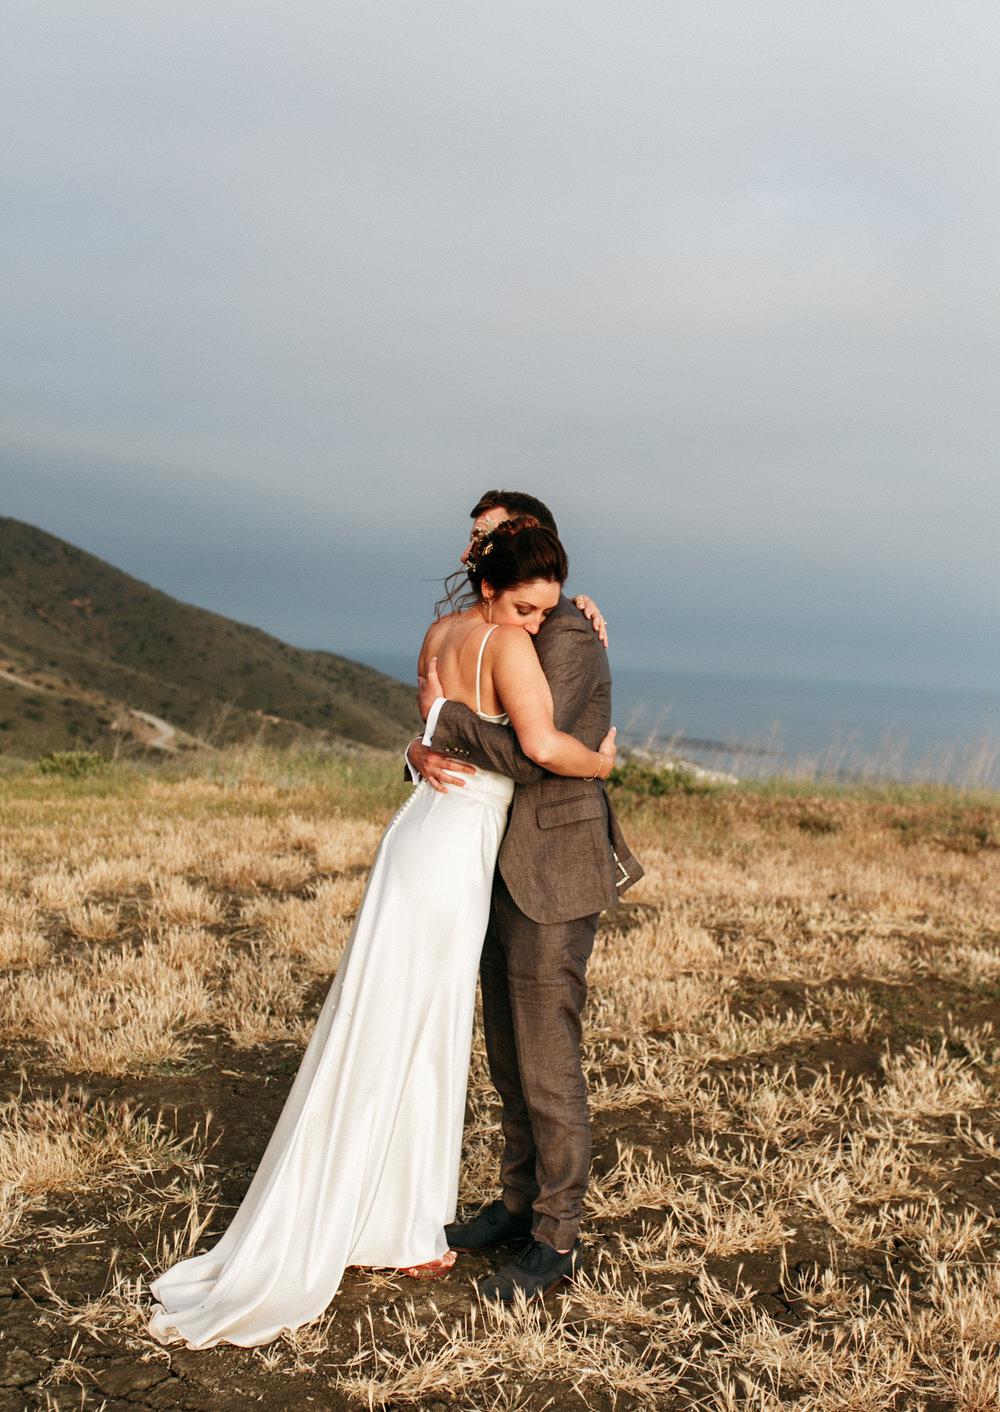 SamErica Studios - Malibu Mountaintop Wedding